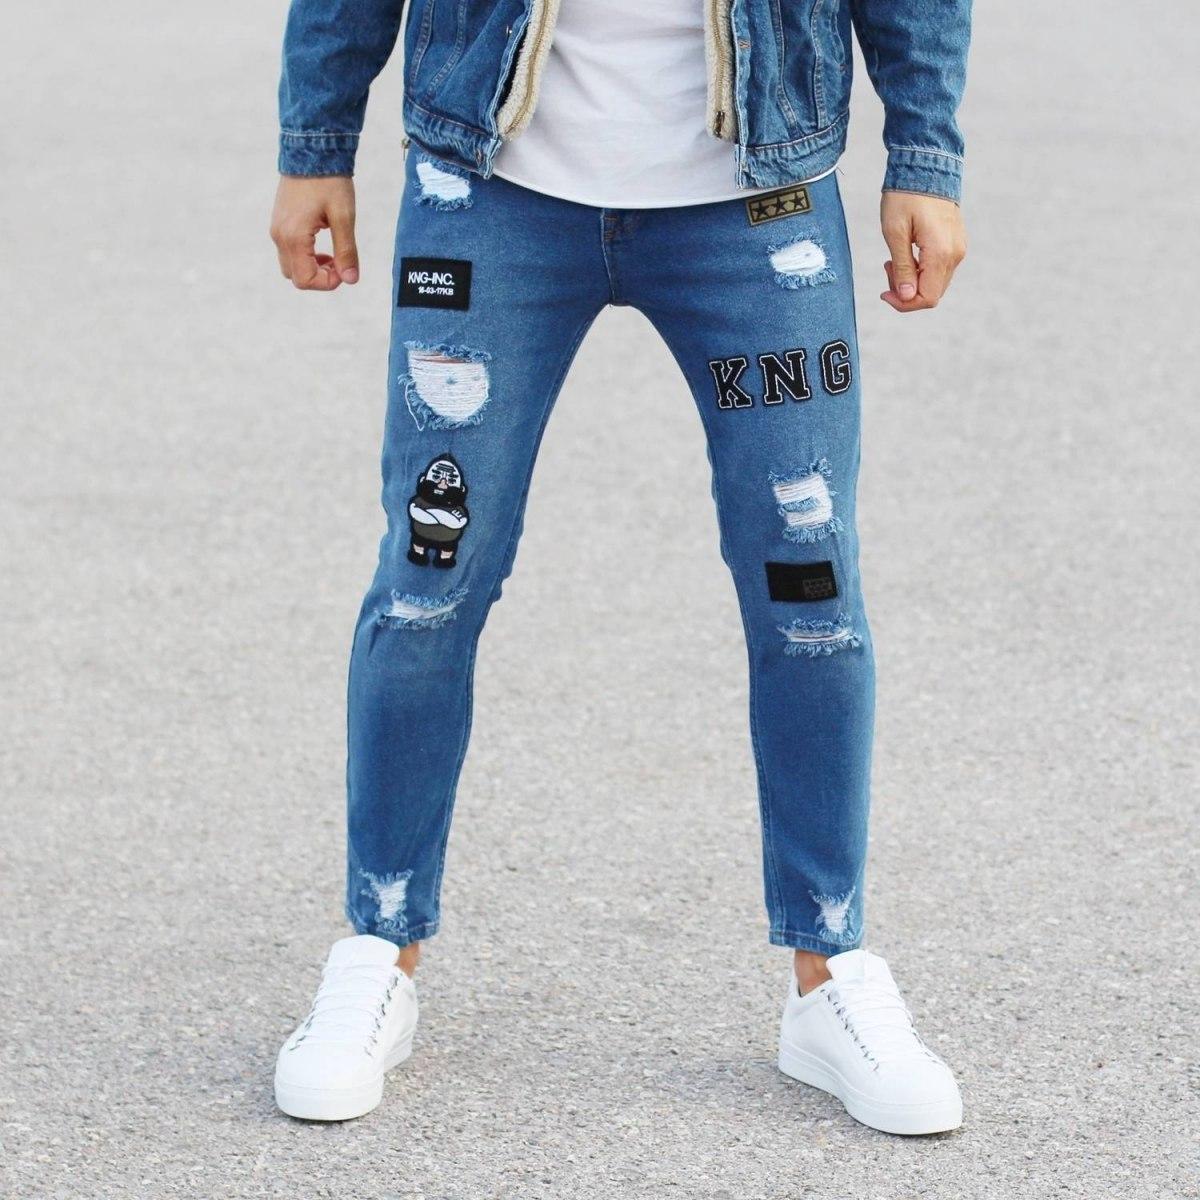 Patch-Work Slim-Fit Jeans in Blue Mv Premium Brand - 1